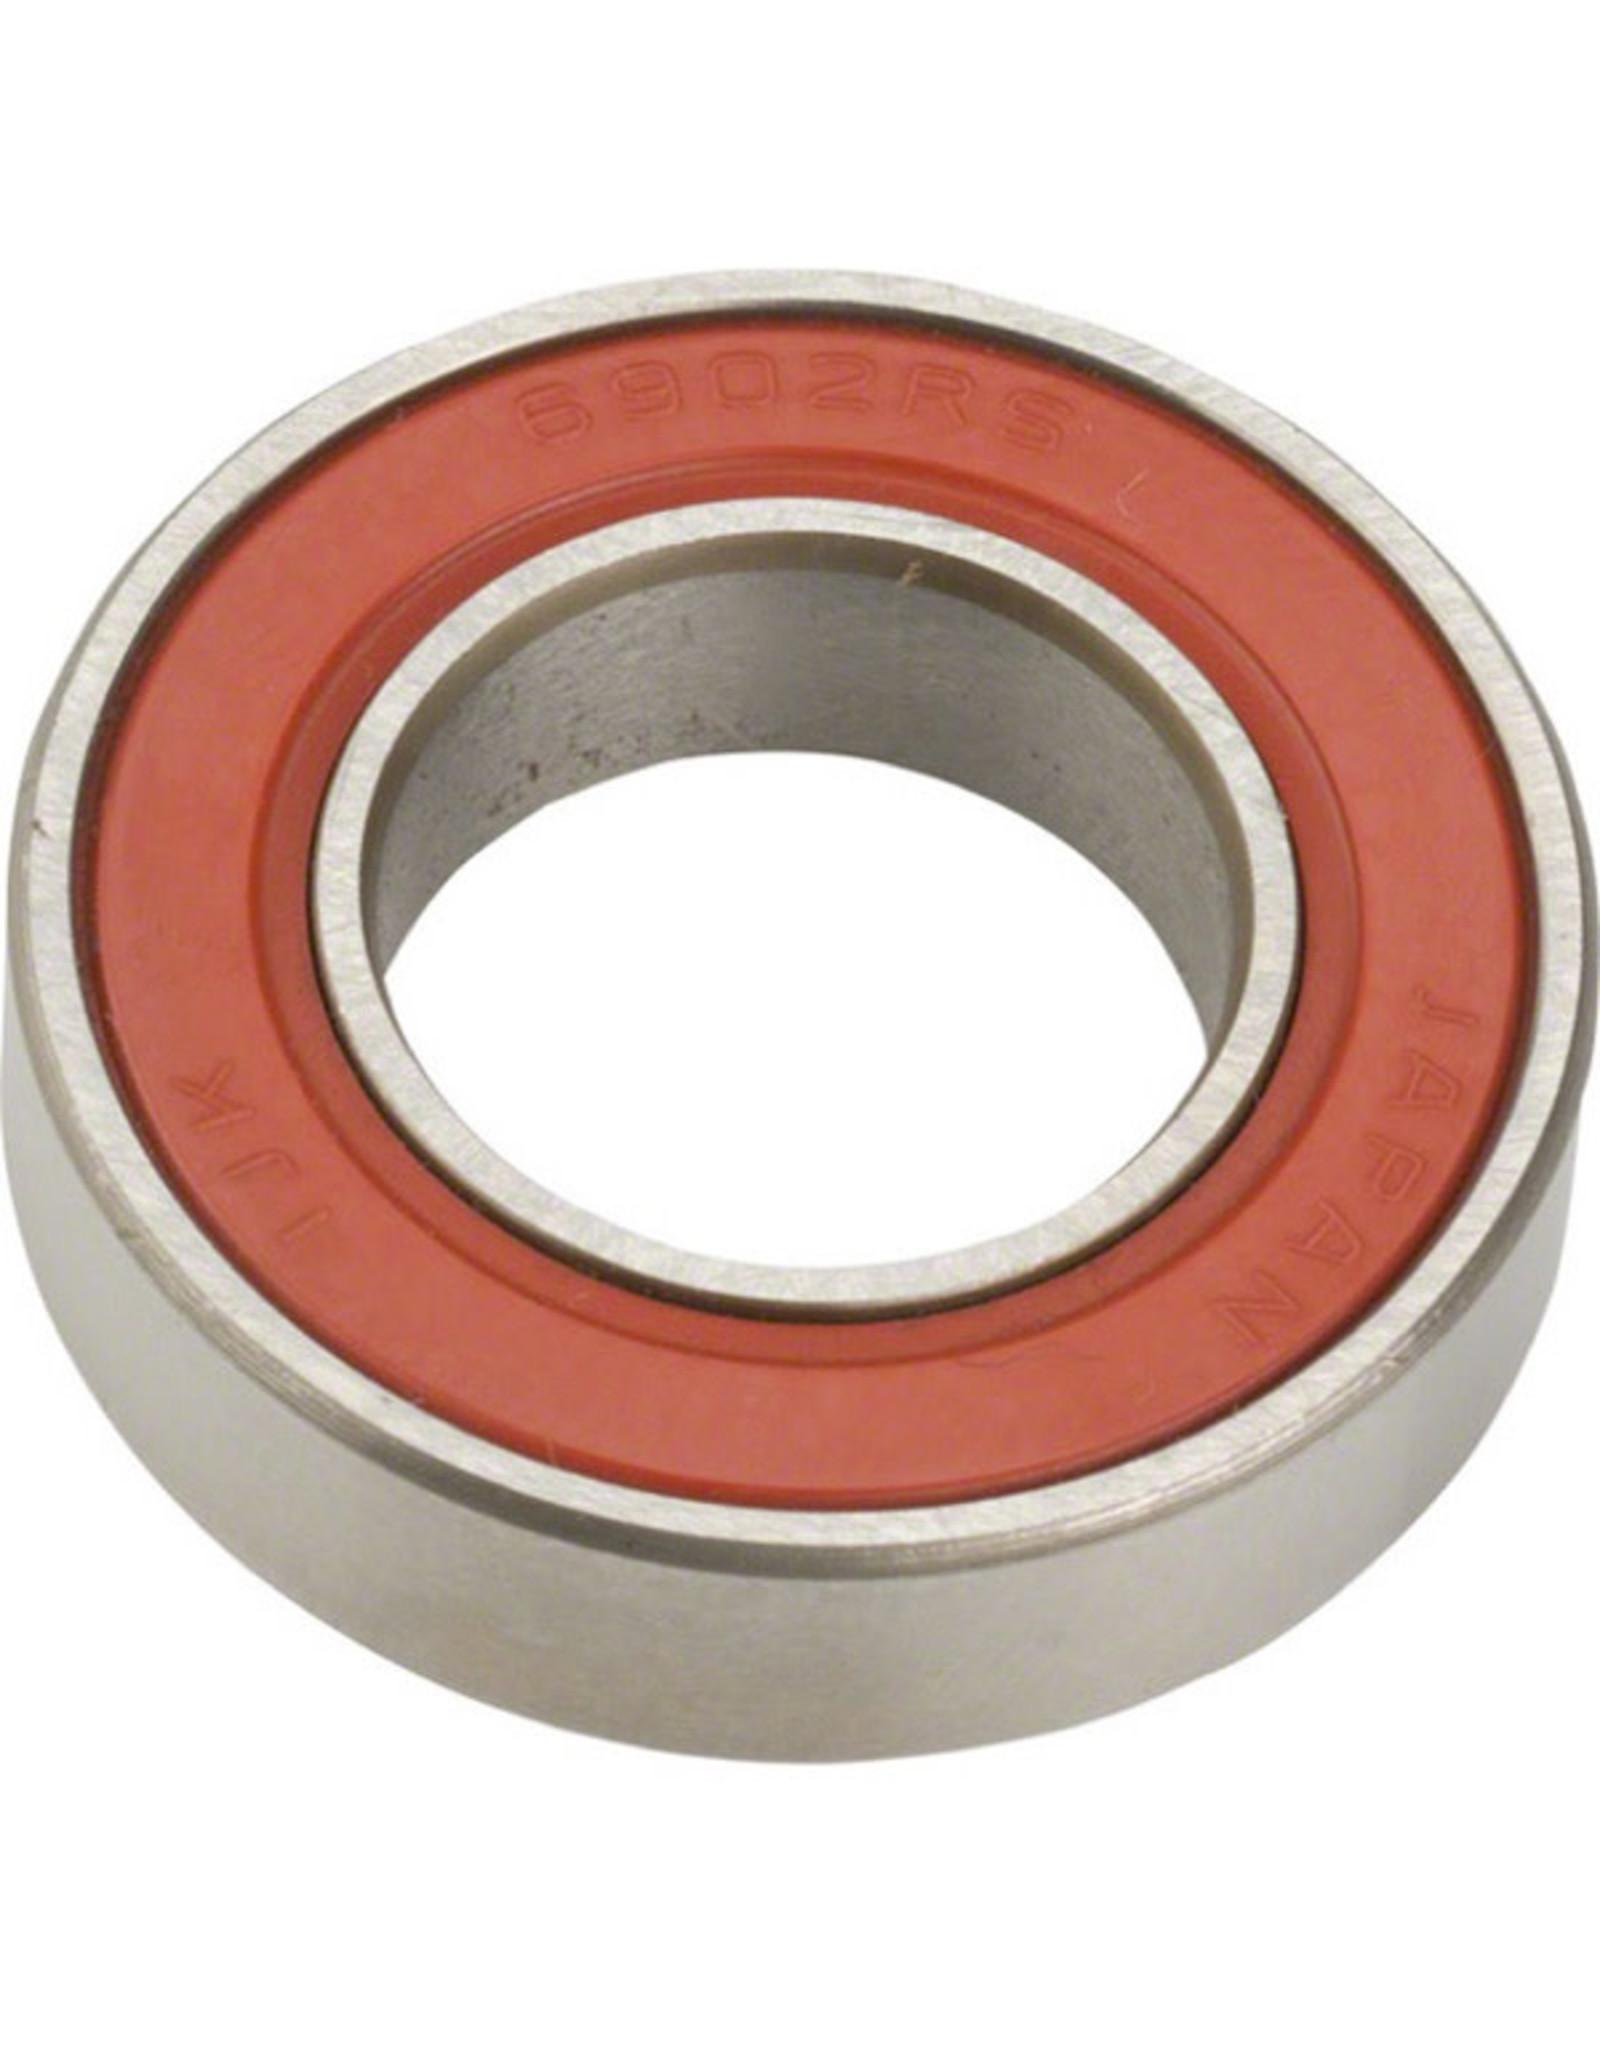 DT Swiss DT Bearing 1526 15 / 26 x 7 mm